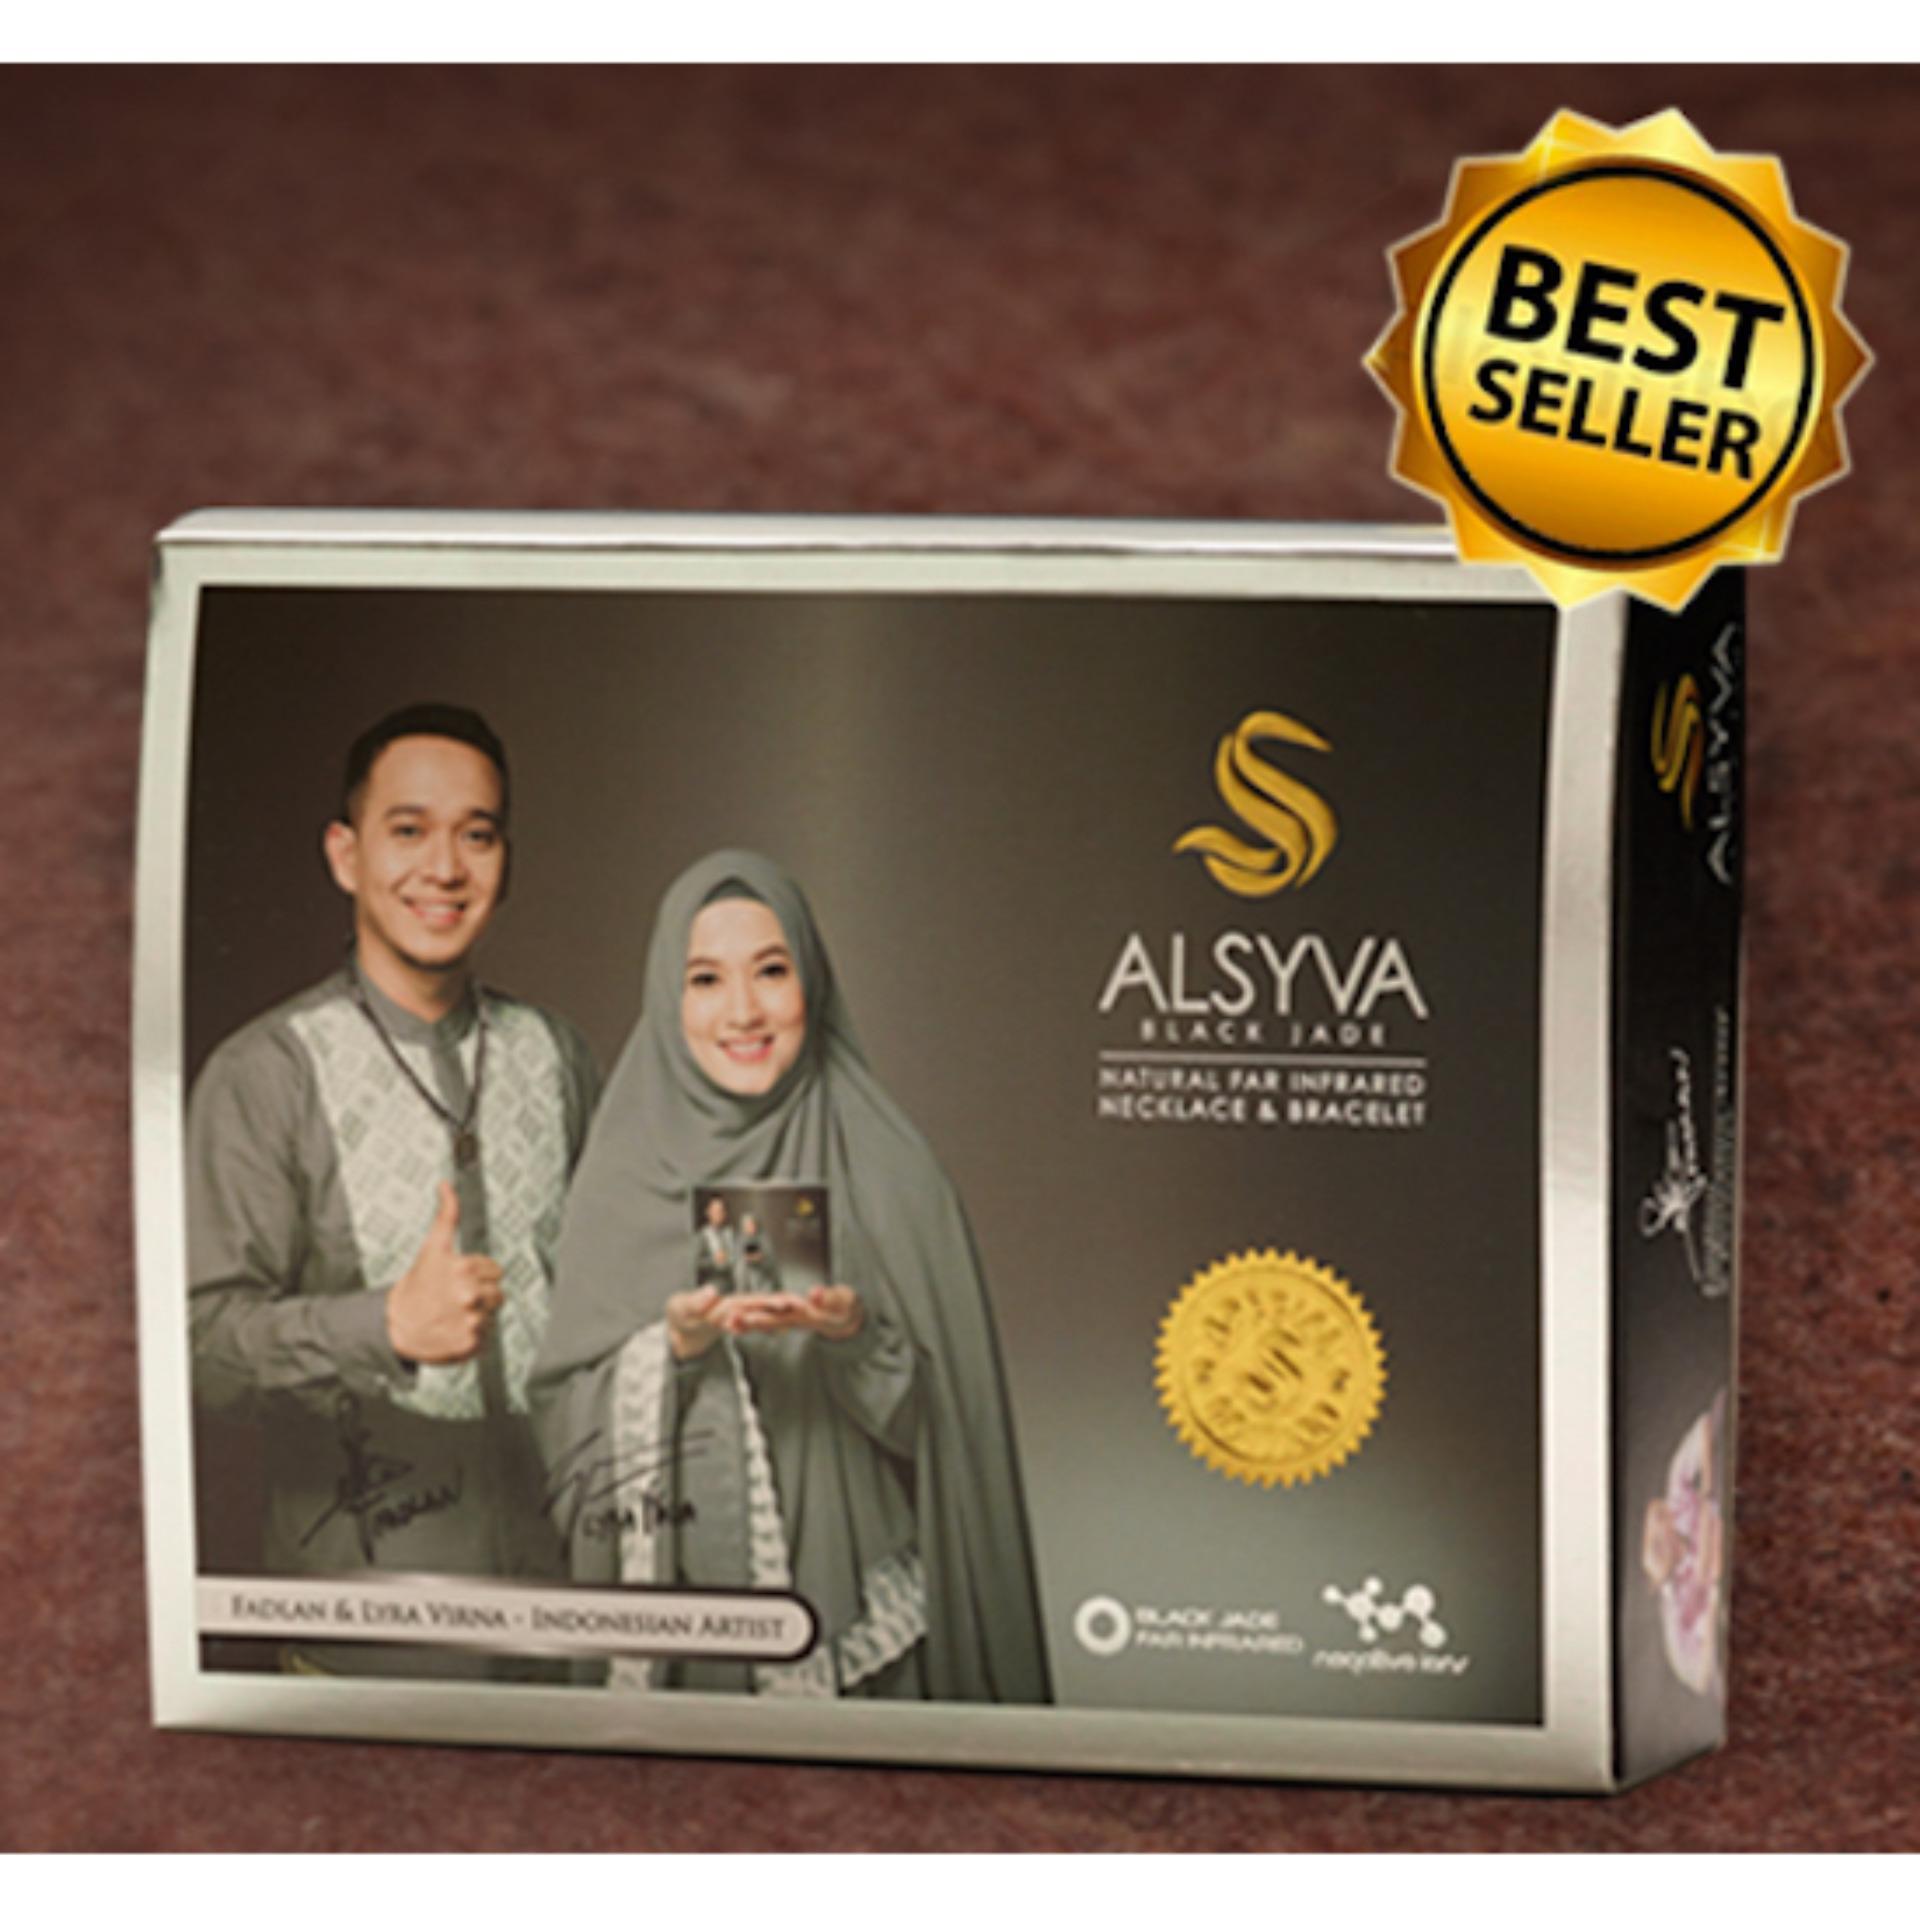 Flash Sale Alsyva Black Jade Kalung Gelang Kesehatan Belanja Terbaik Untuk